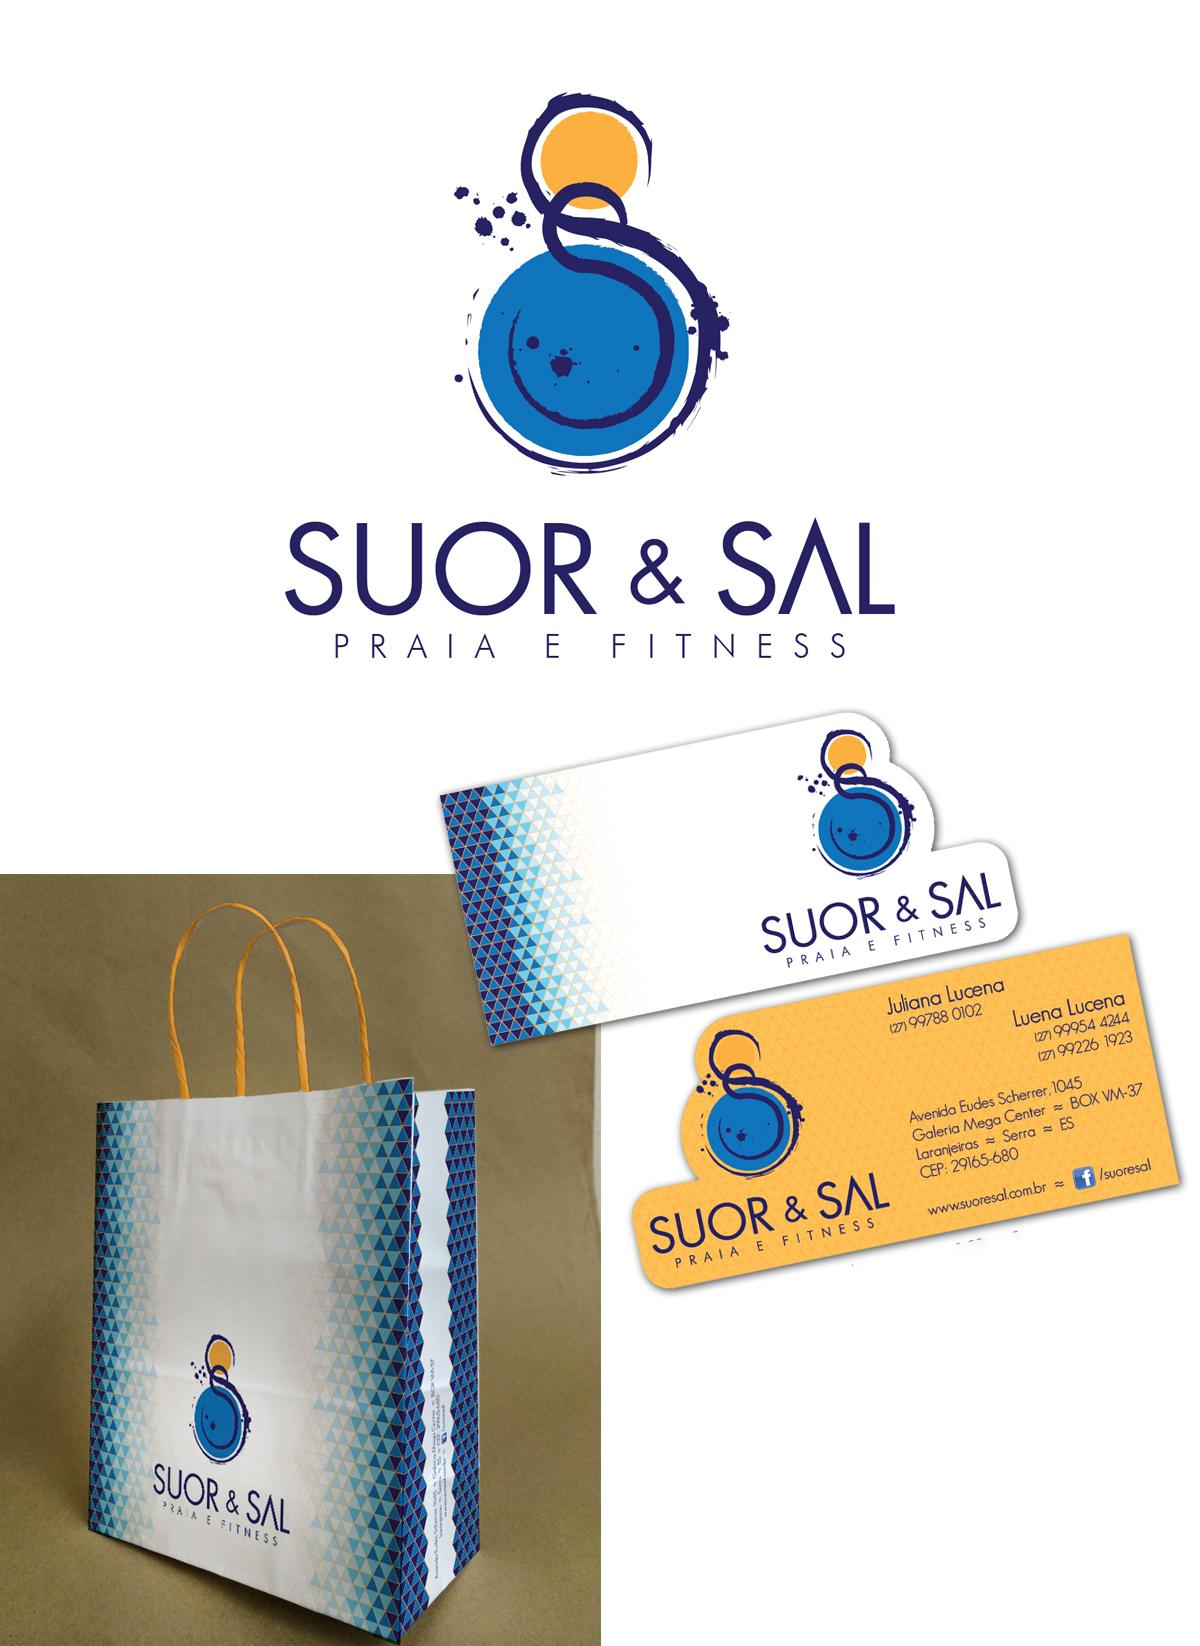 Suor & Sal